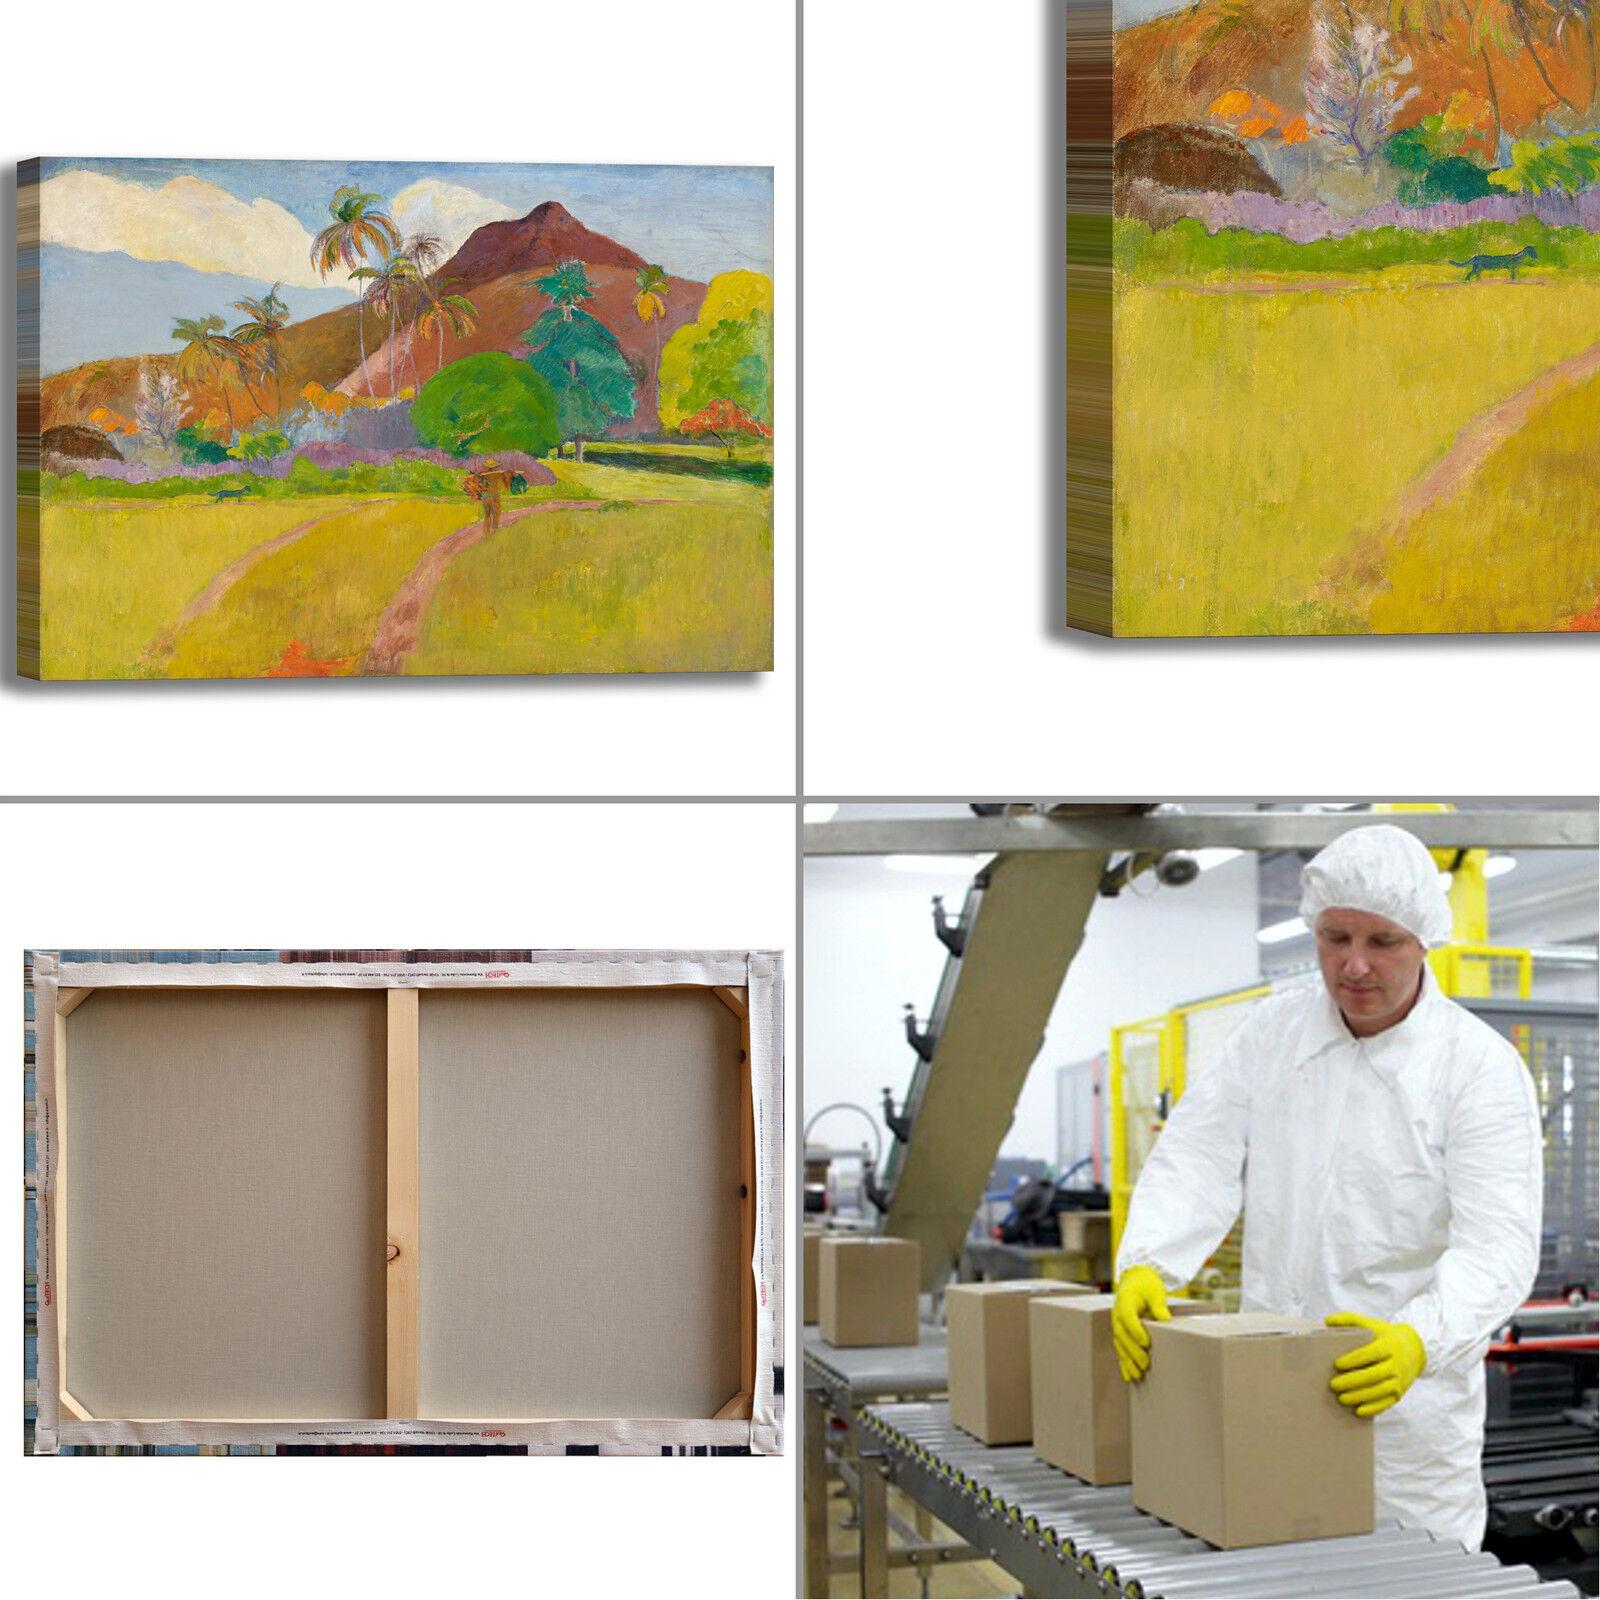 Gauguin paesaggio tahitiano design quadro stampa tela dipinto arRouge telaio arRouge dipinto o casa 4dc83e